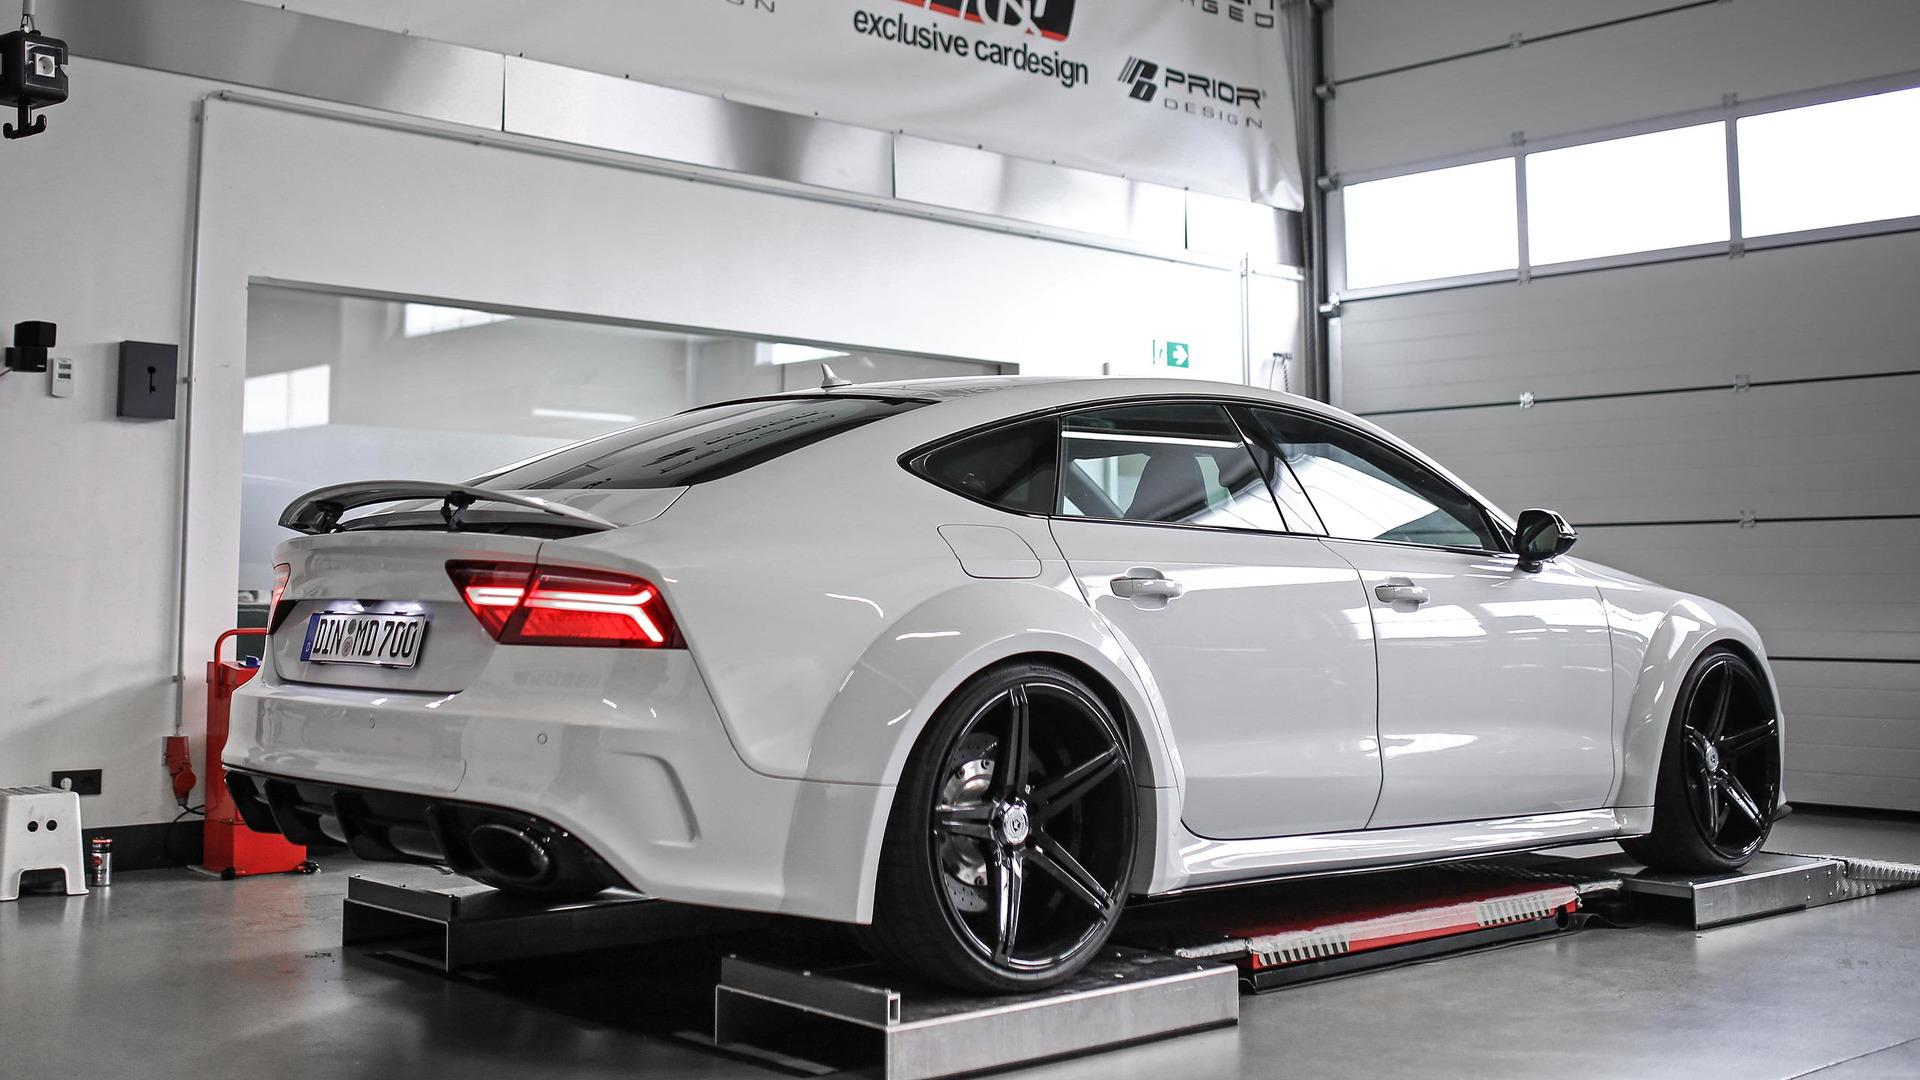 M Amp D Exclusive Car Design Boosts Audi S7 To 690 Hp Paul Tan